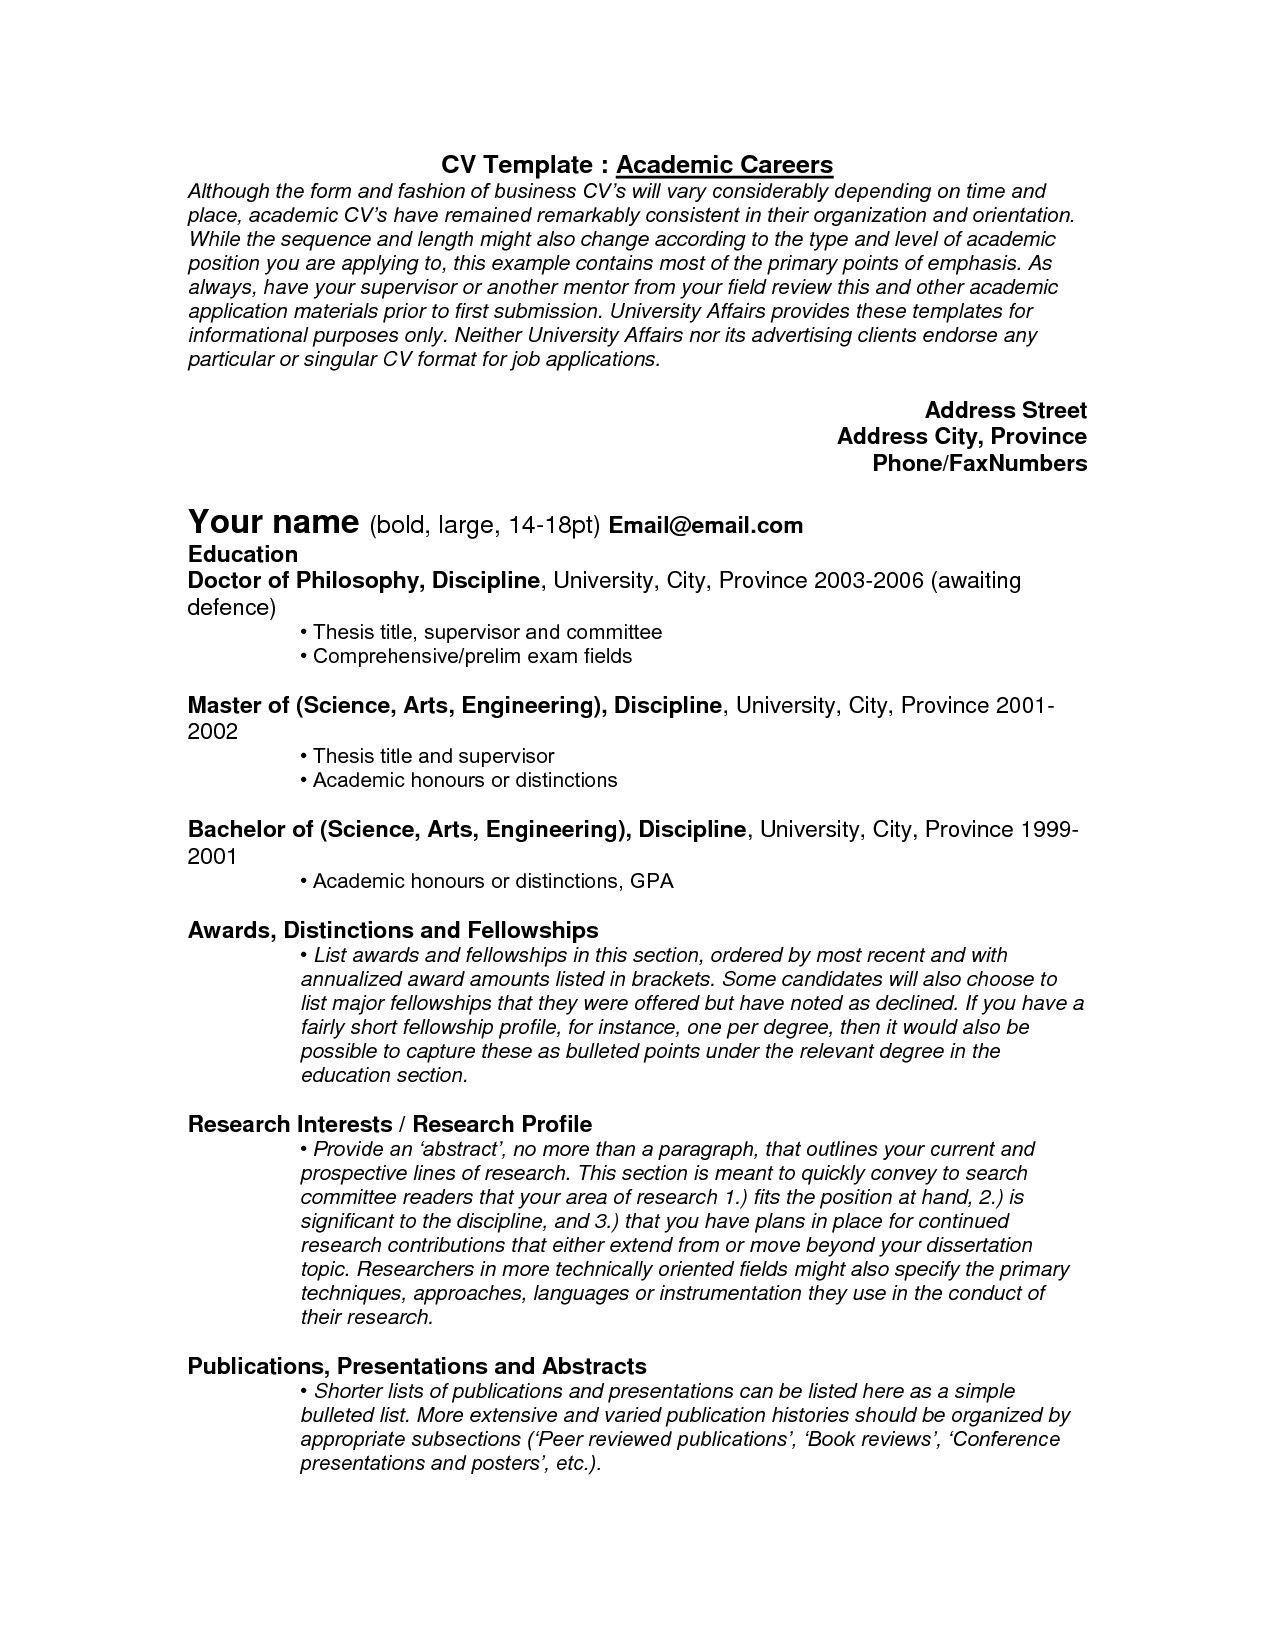 Resume Templates Uoft Resume Resumetemplates Templates Cover Letter For Resume Resume Examples Resume Software